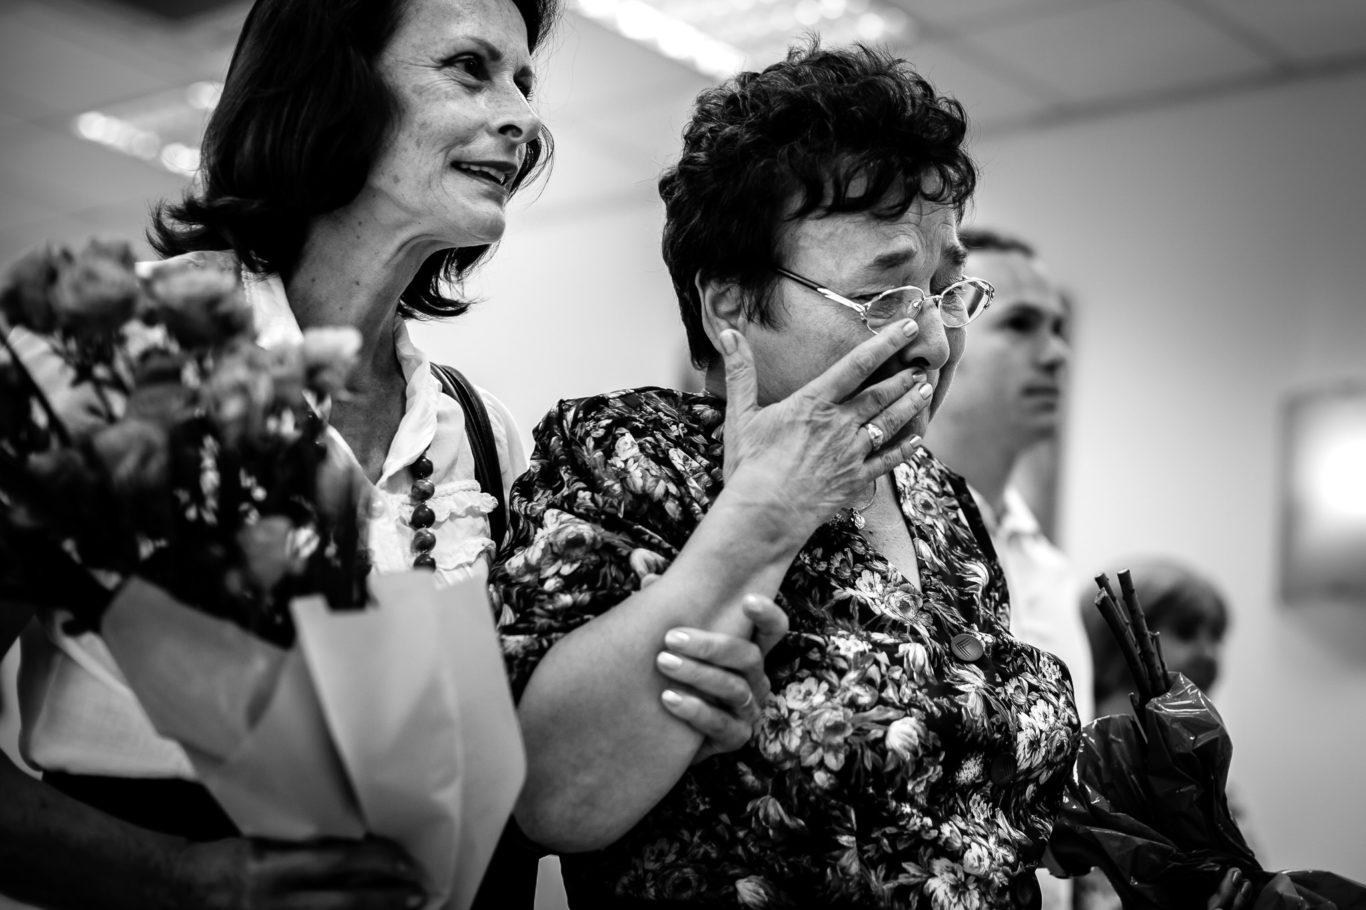 0044-fotografie-nunta-bucuresti-dana-radu-fotograf-ciprian-dumitrescu-cd2_6164